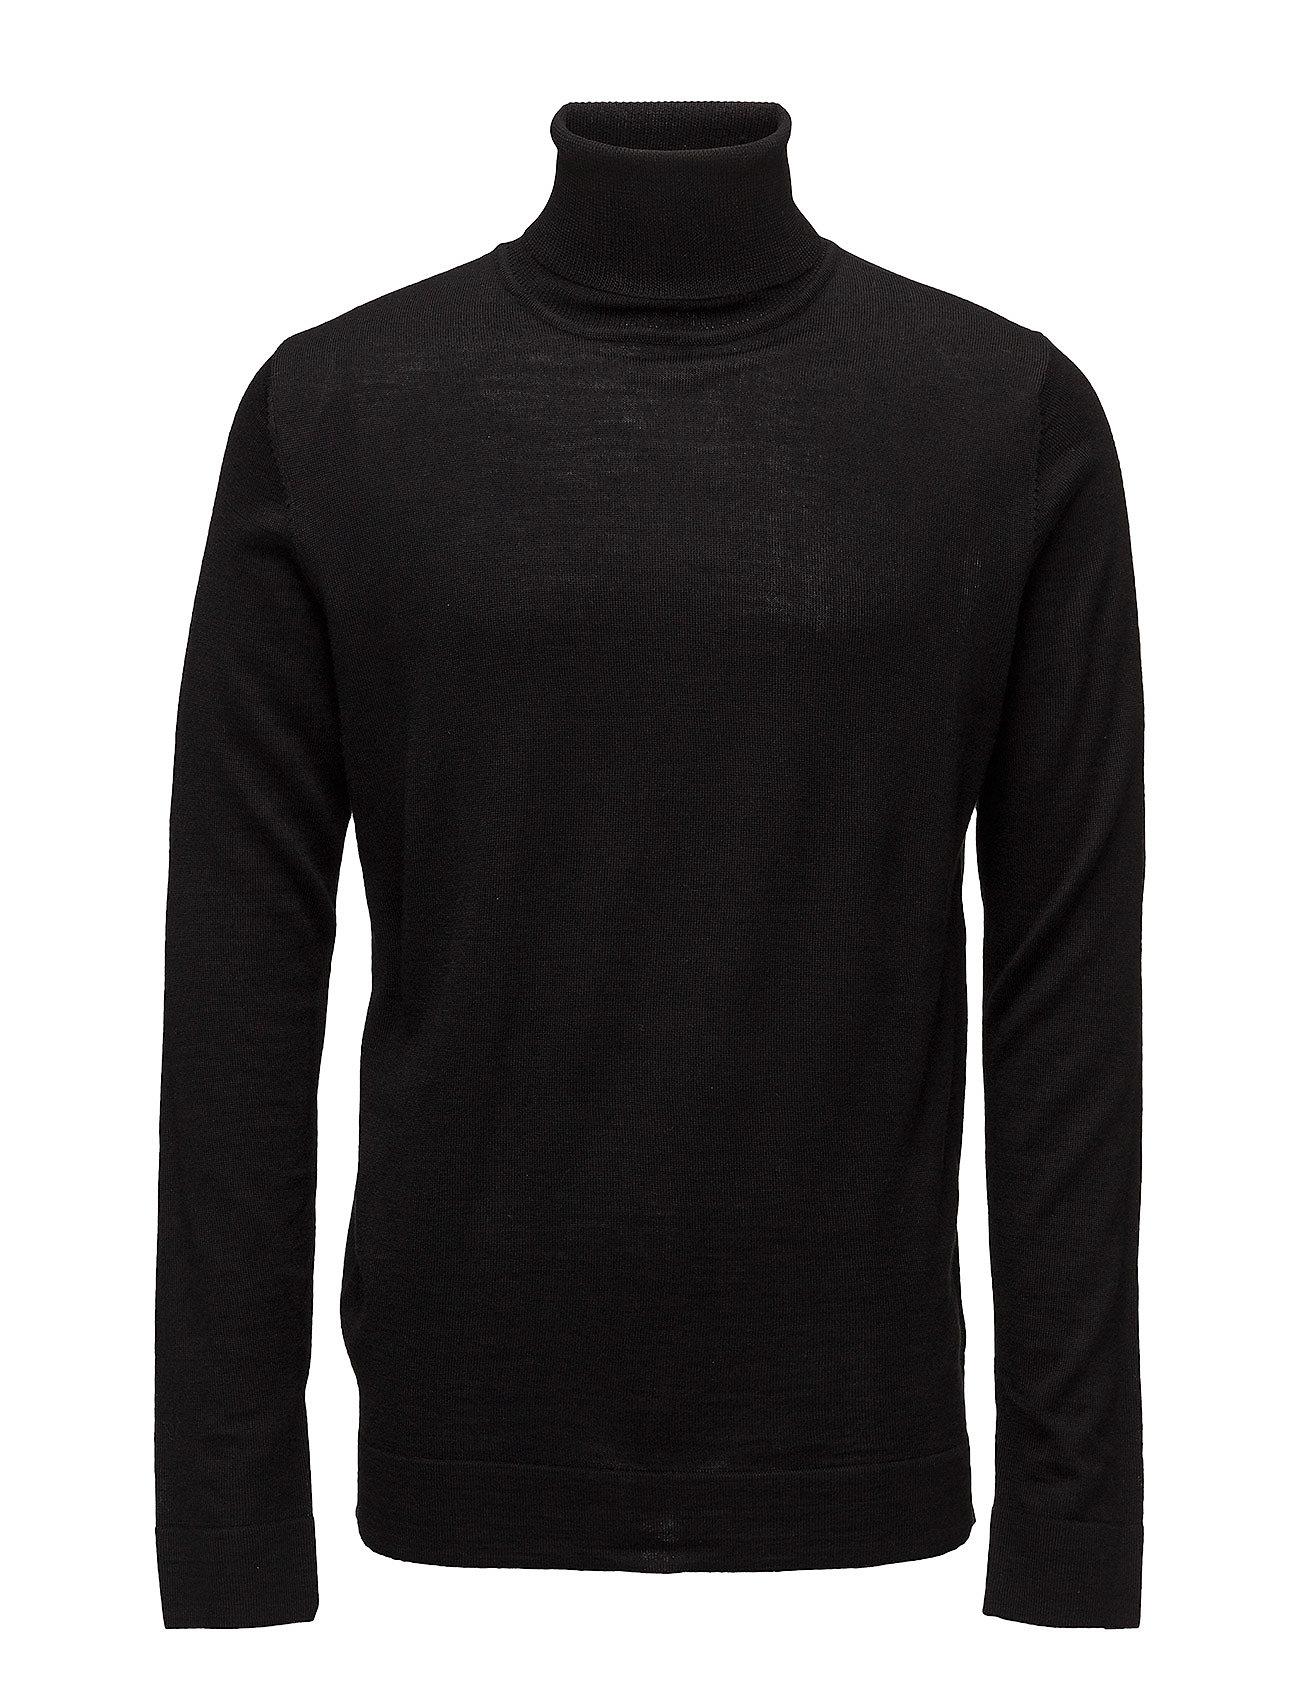 Lindbergh Merino knit roll-neck - BLACK